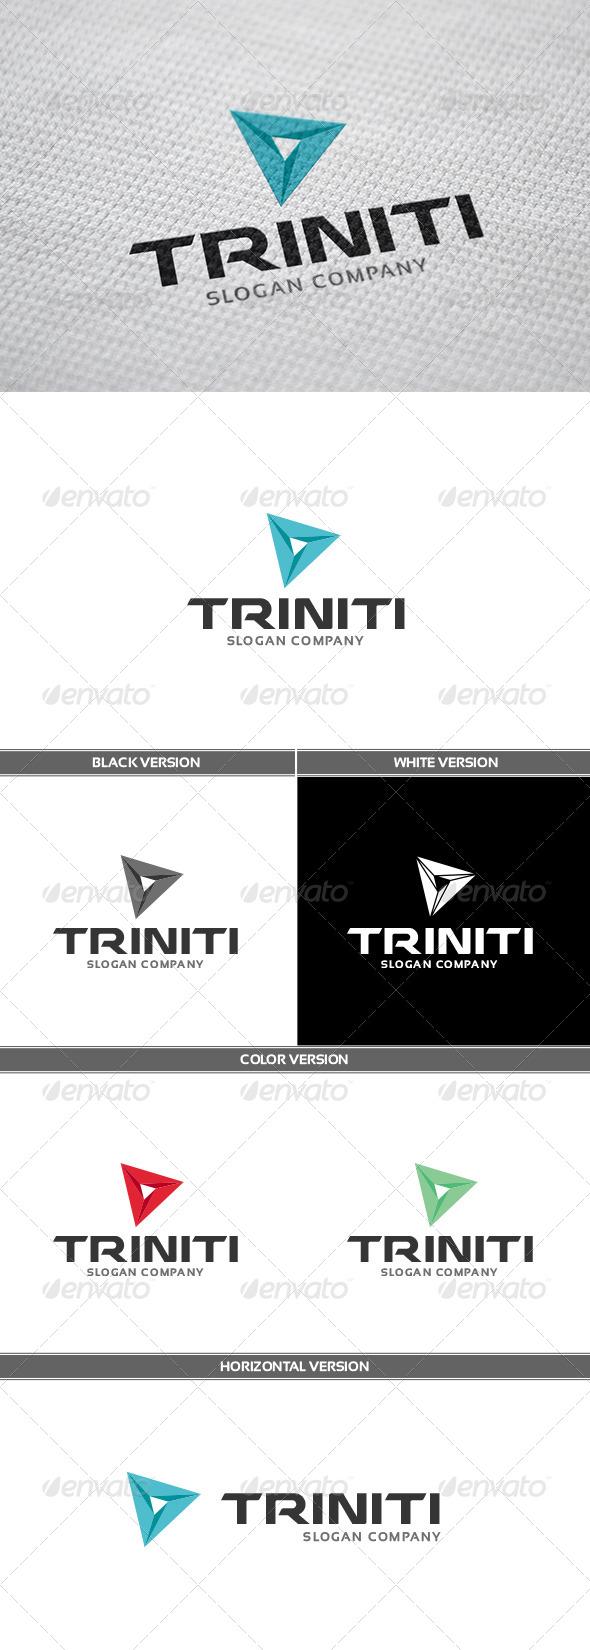 GraphicRiver Triniti Logo 6714740